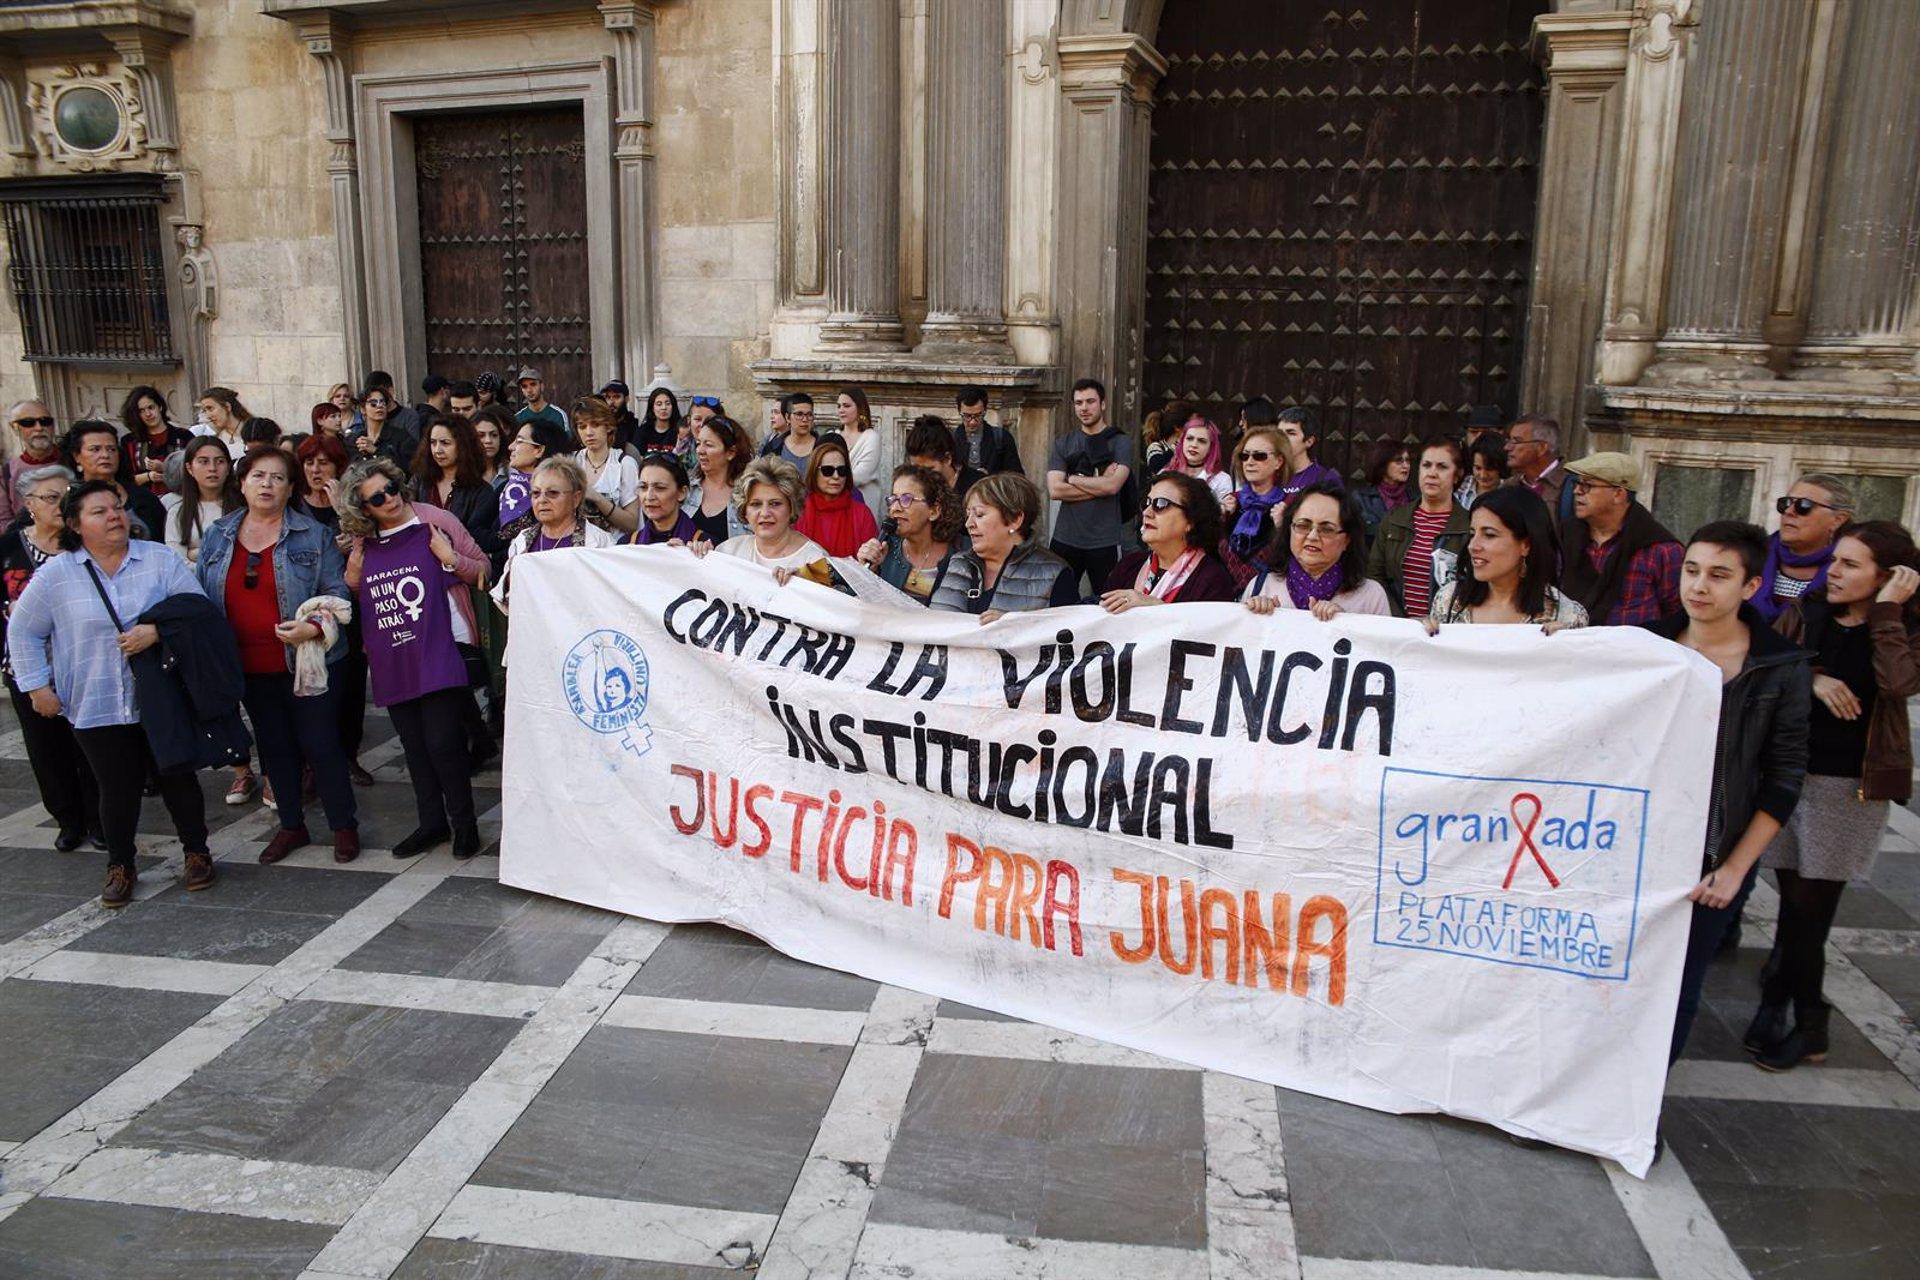 La Plataforma 25N ve «tremendamente injusta» la condena del Supremo a Juana Rivas